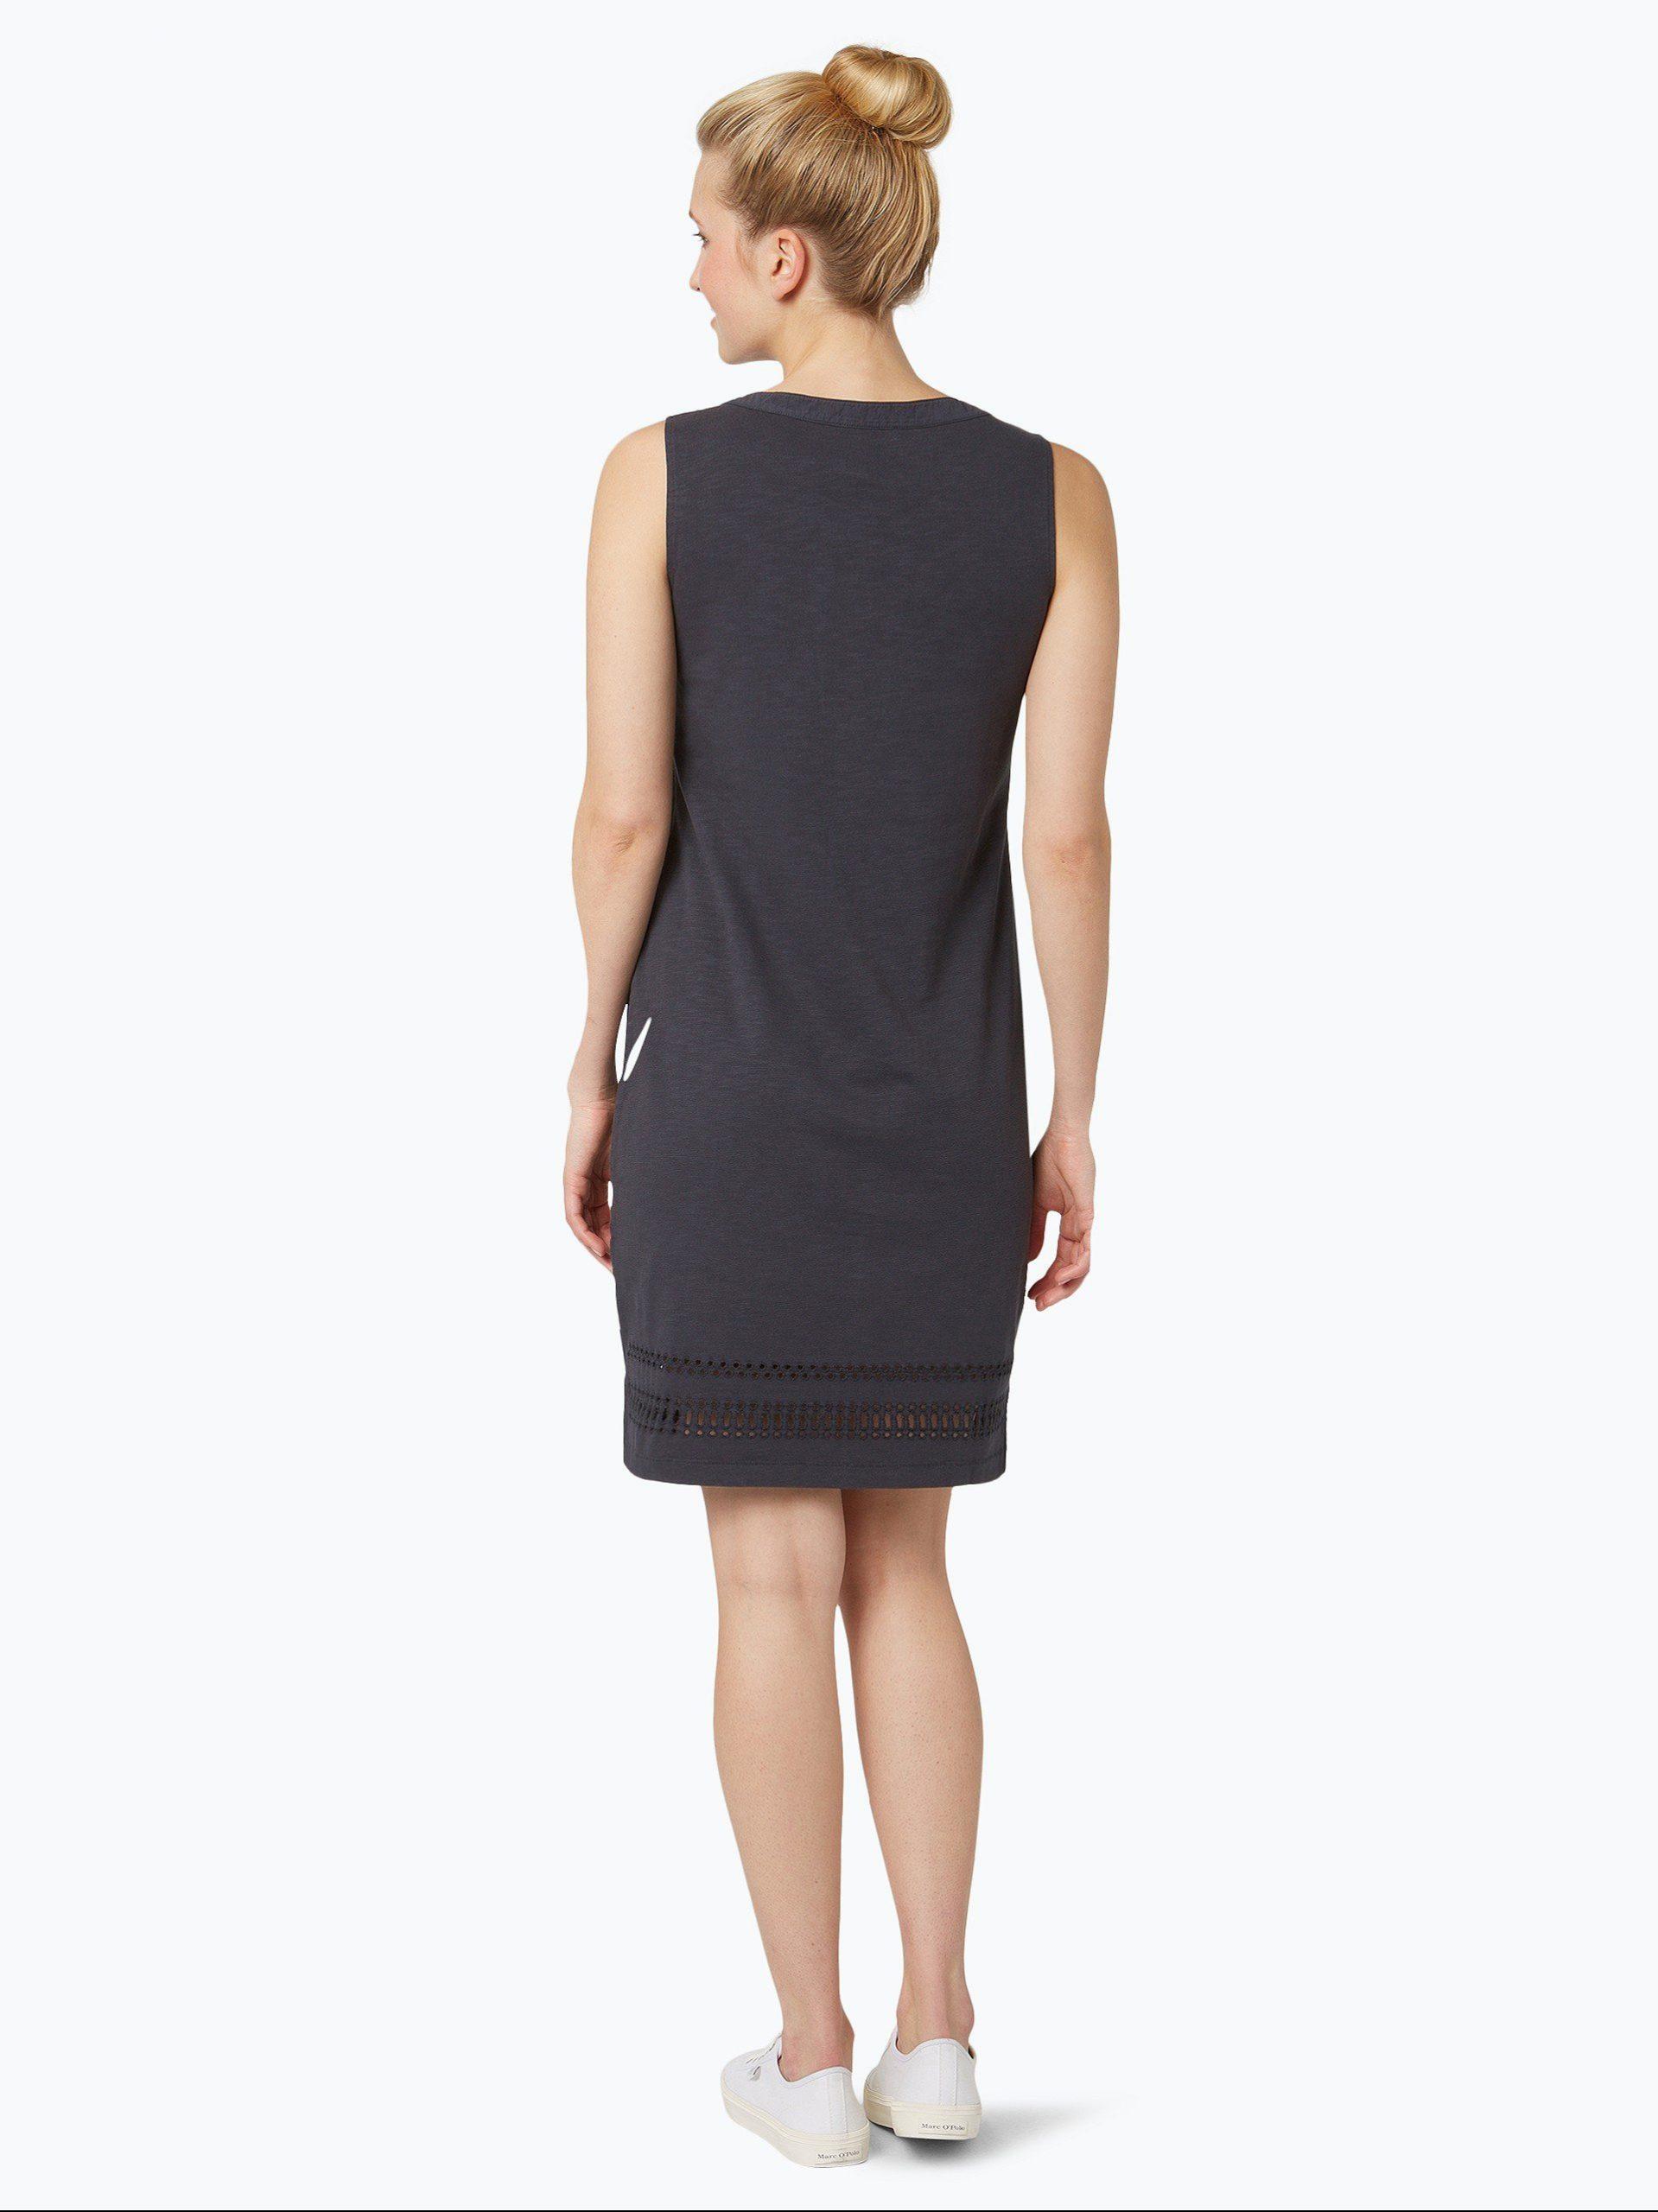 Marc O'polo Damen Kleid Online Kaufen  Vangraaf